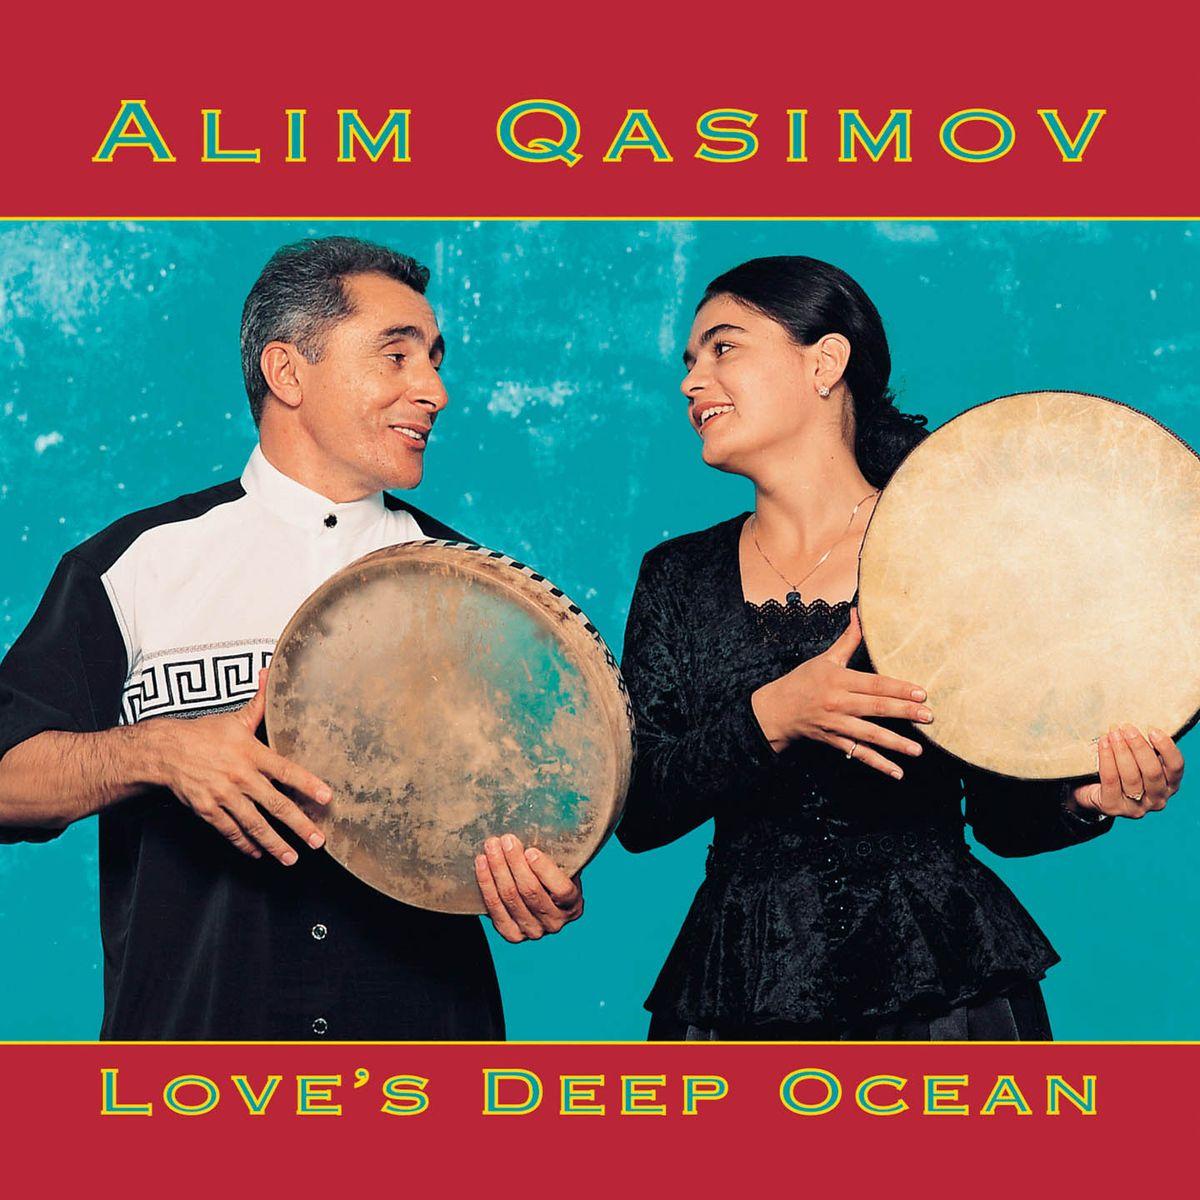 Алим Касимов Alim Qasimov Ensemble. Love's Deep Ocean binful 6 7 9 9 7 soft tablet case cover for ipad mini 2 3 4 air 1 universal liner sleeve tablets zipper pouch bag